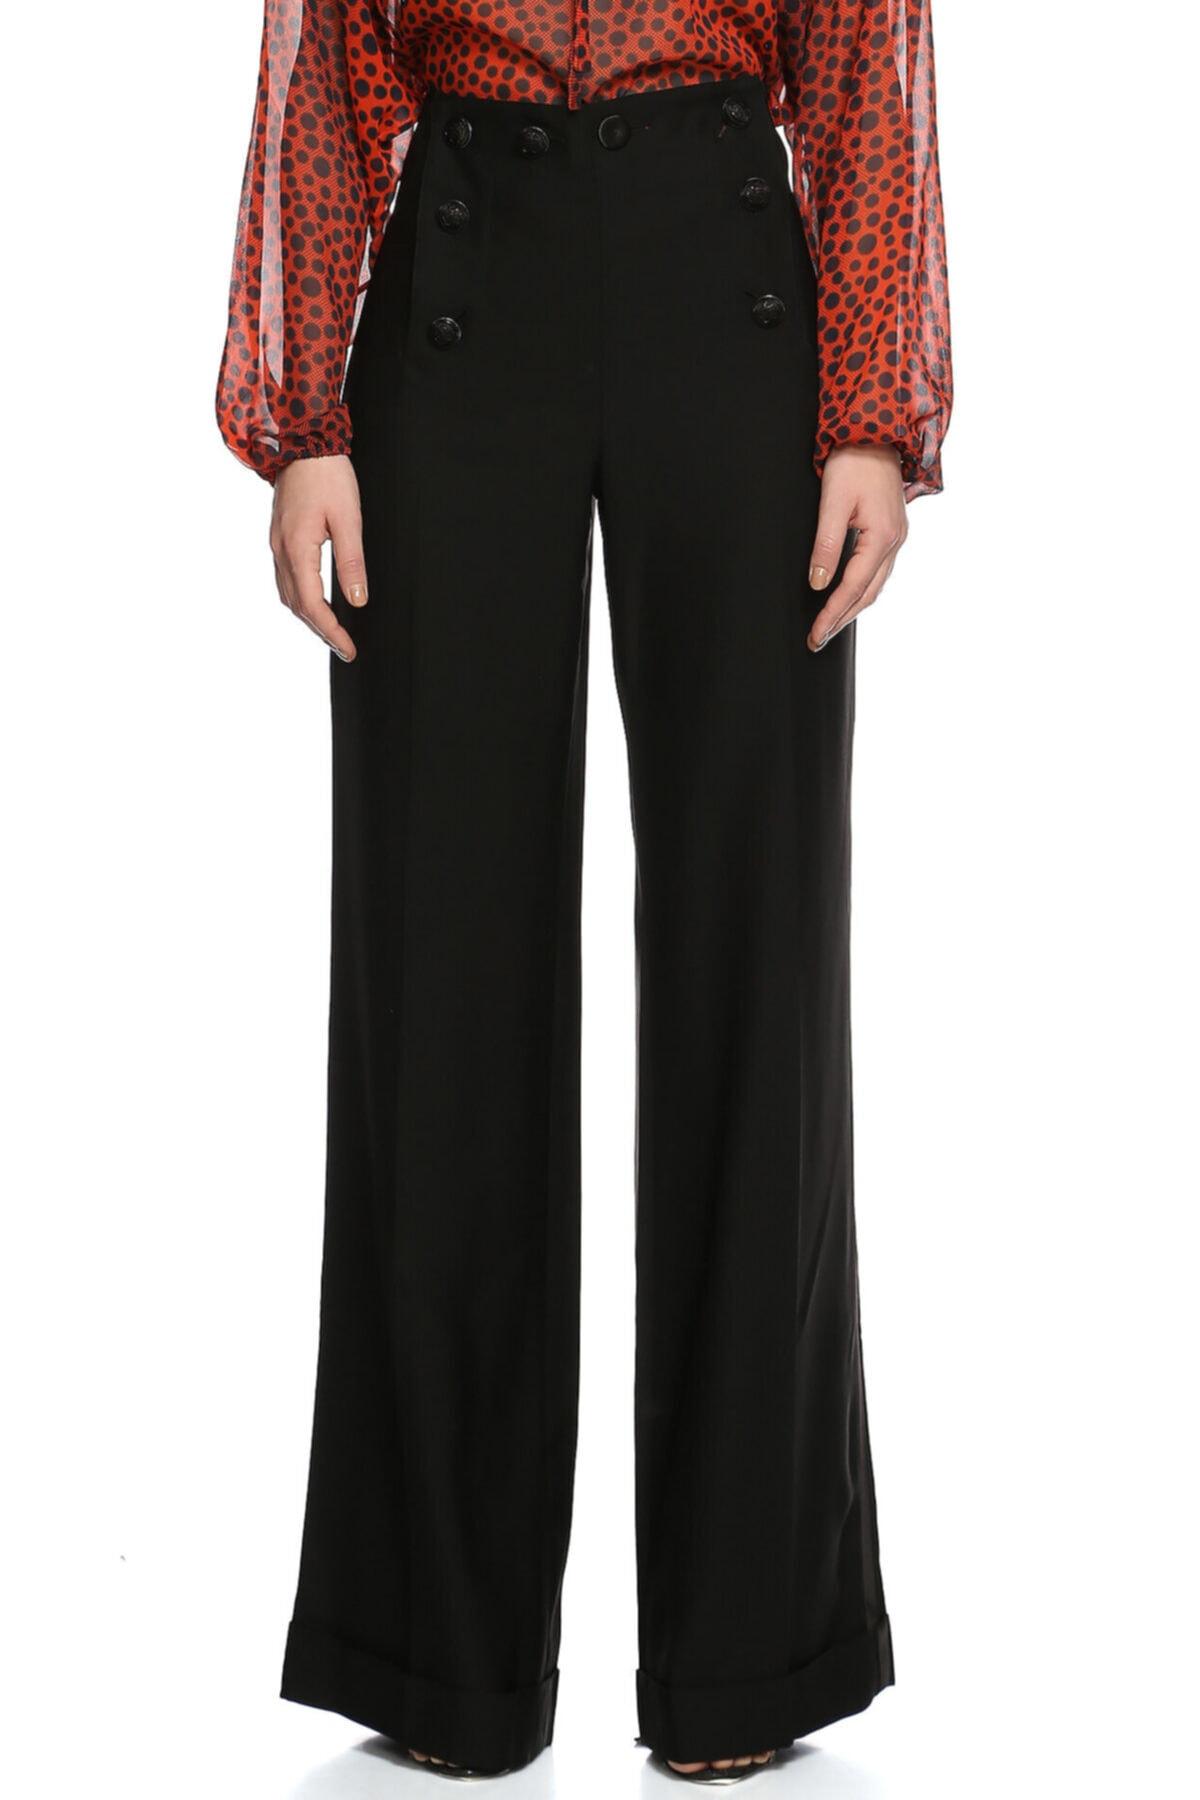 Jean Paul Gaultier Kadın Siyah Bol Paça Pantolon 1